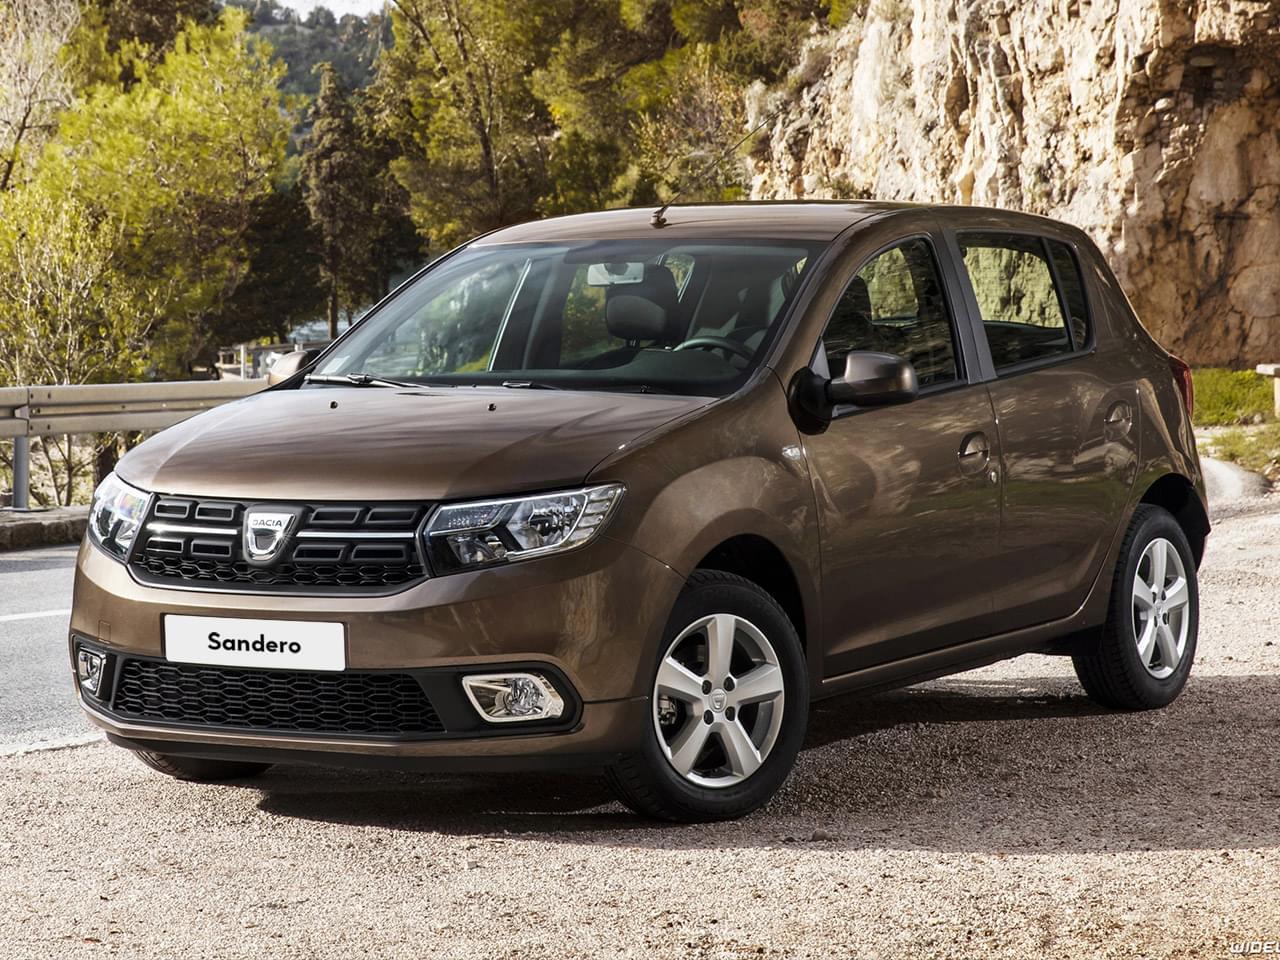 Dacia Sandero Comfort SCe 75